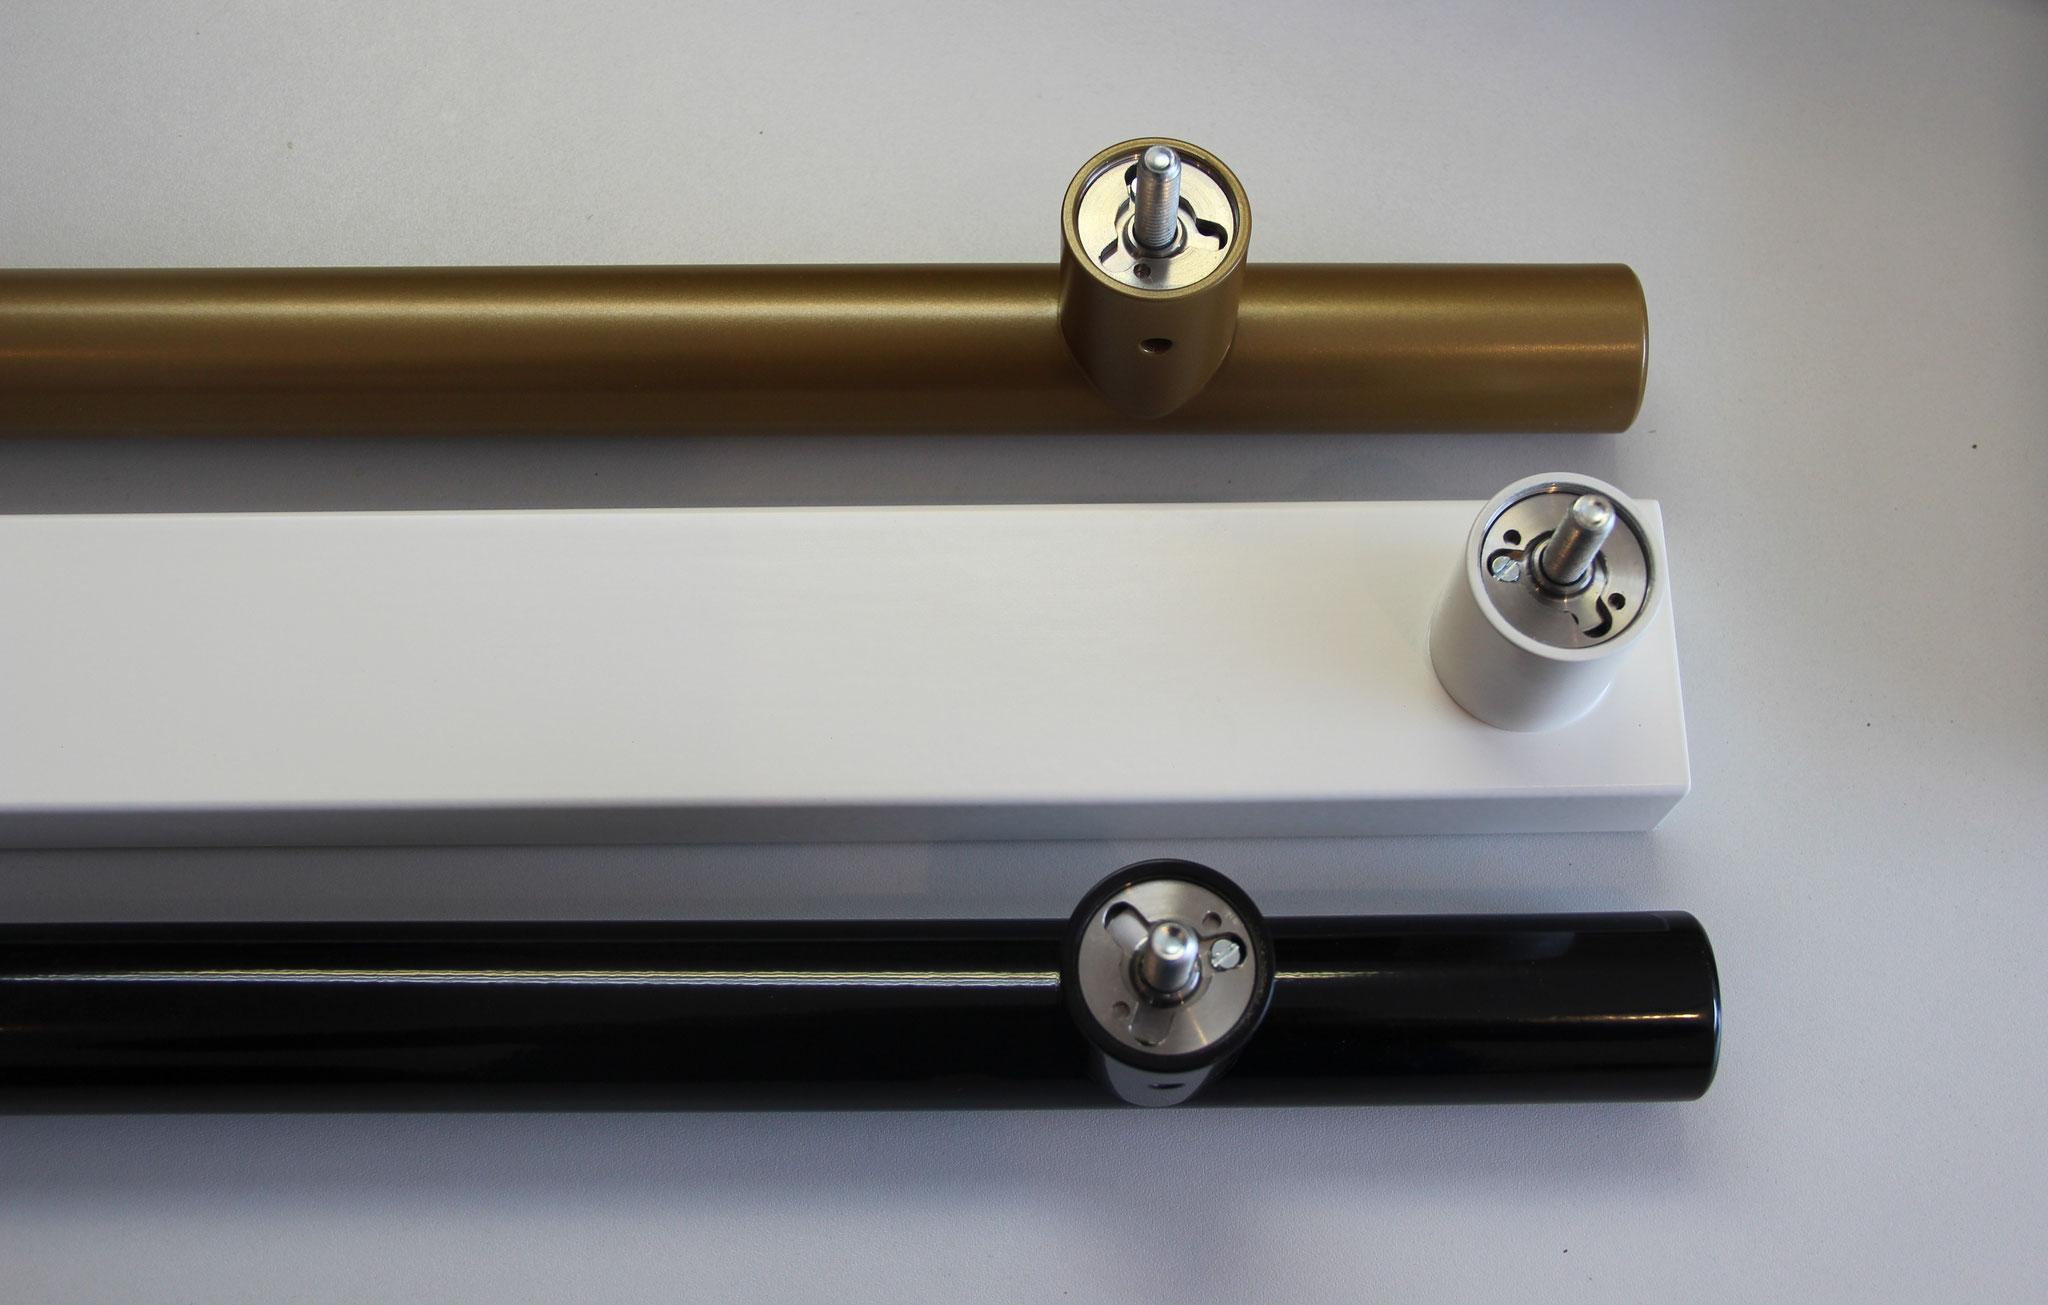 Powder-coated e-li handrails for your design